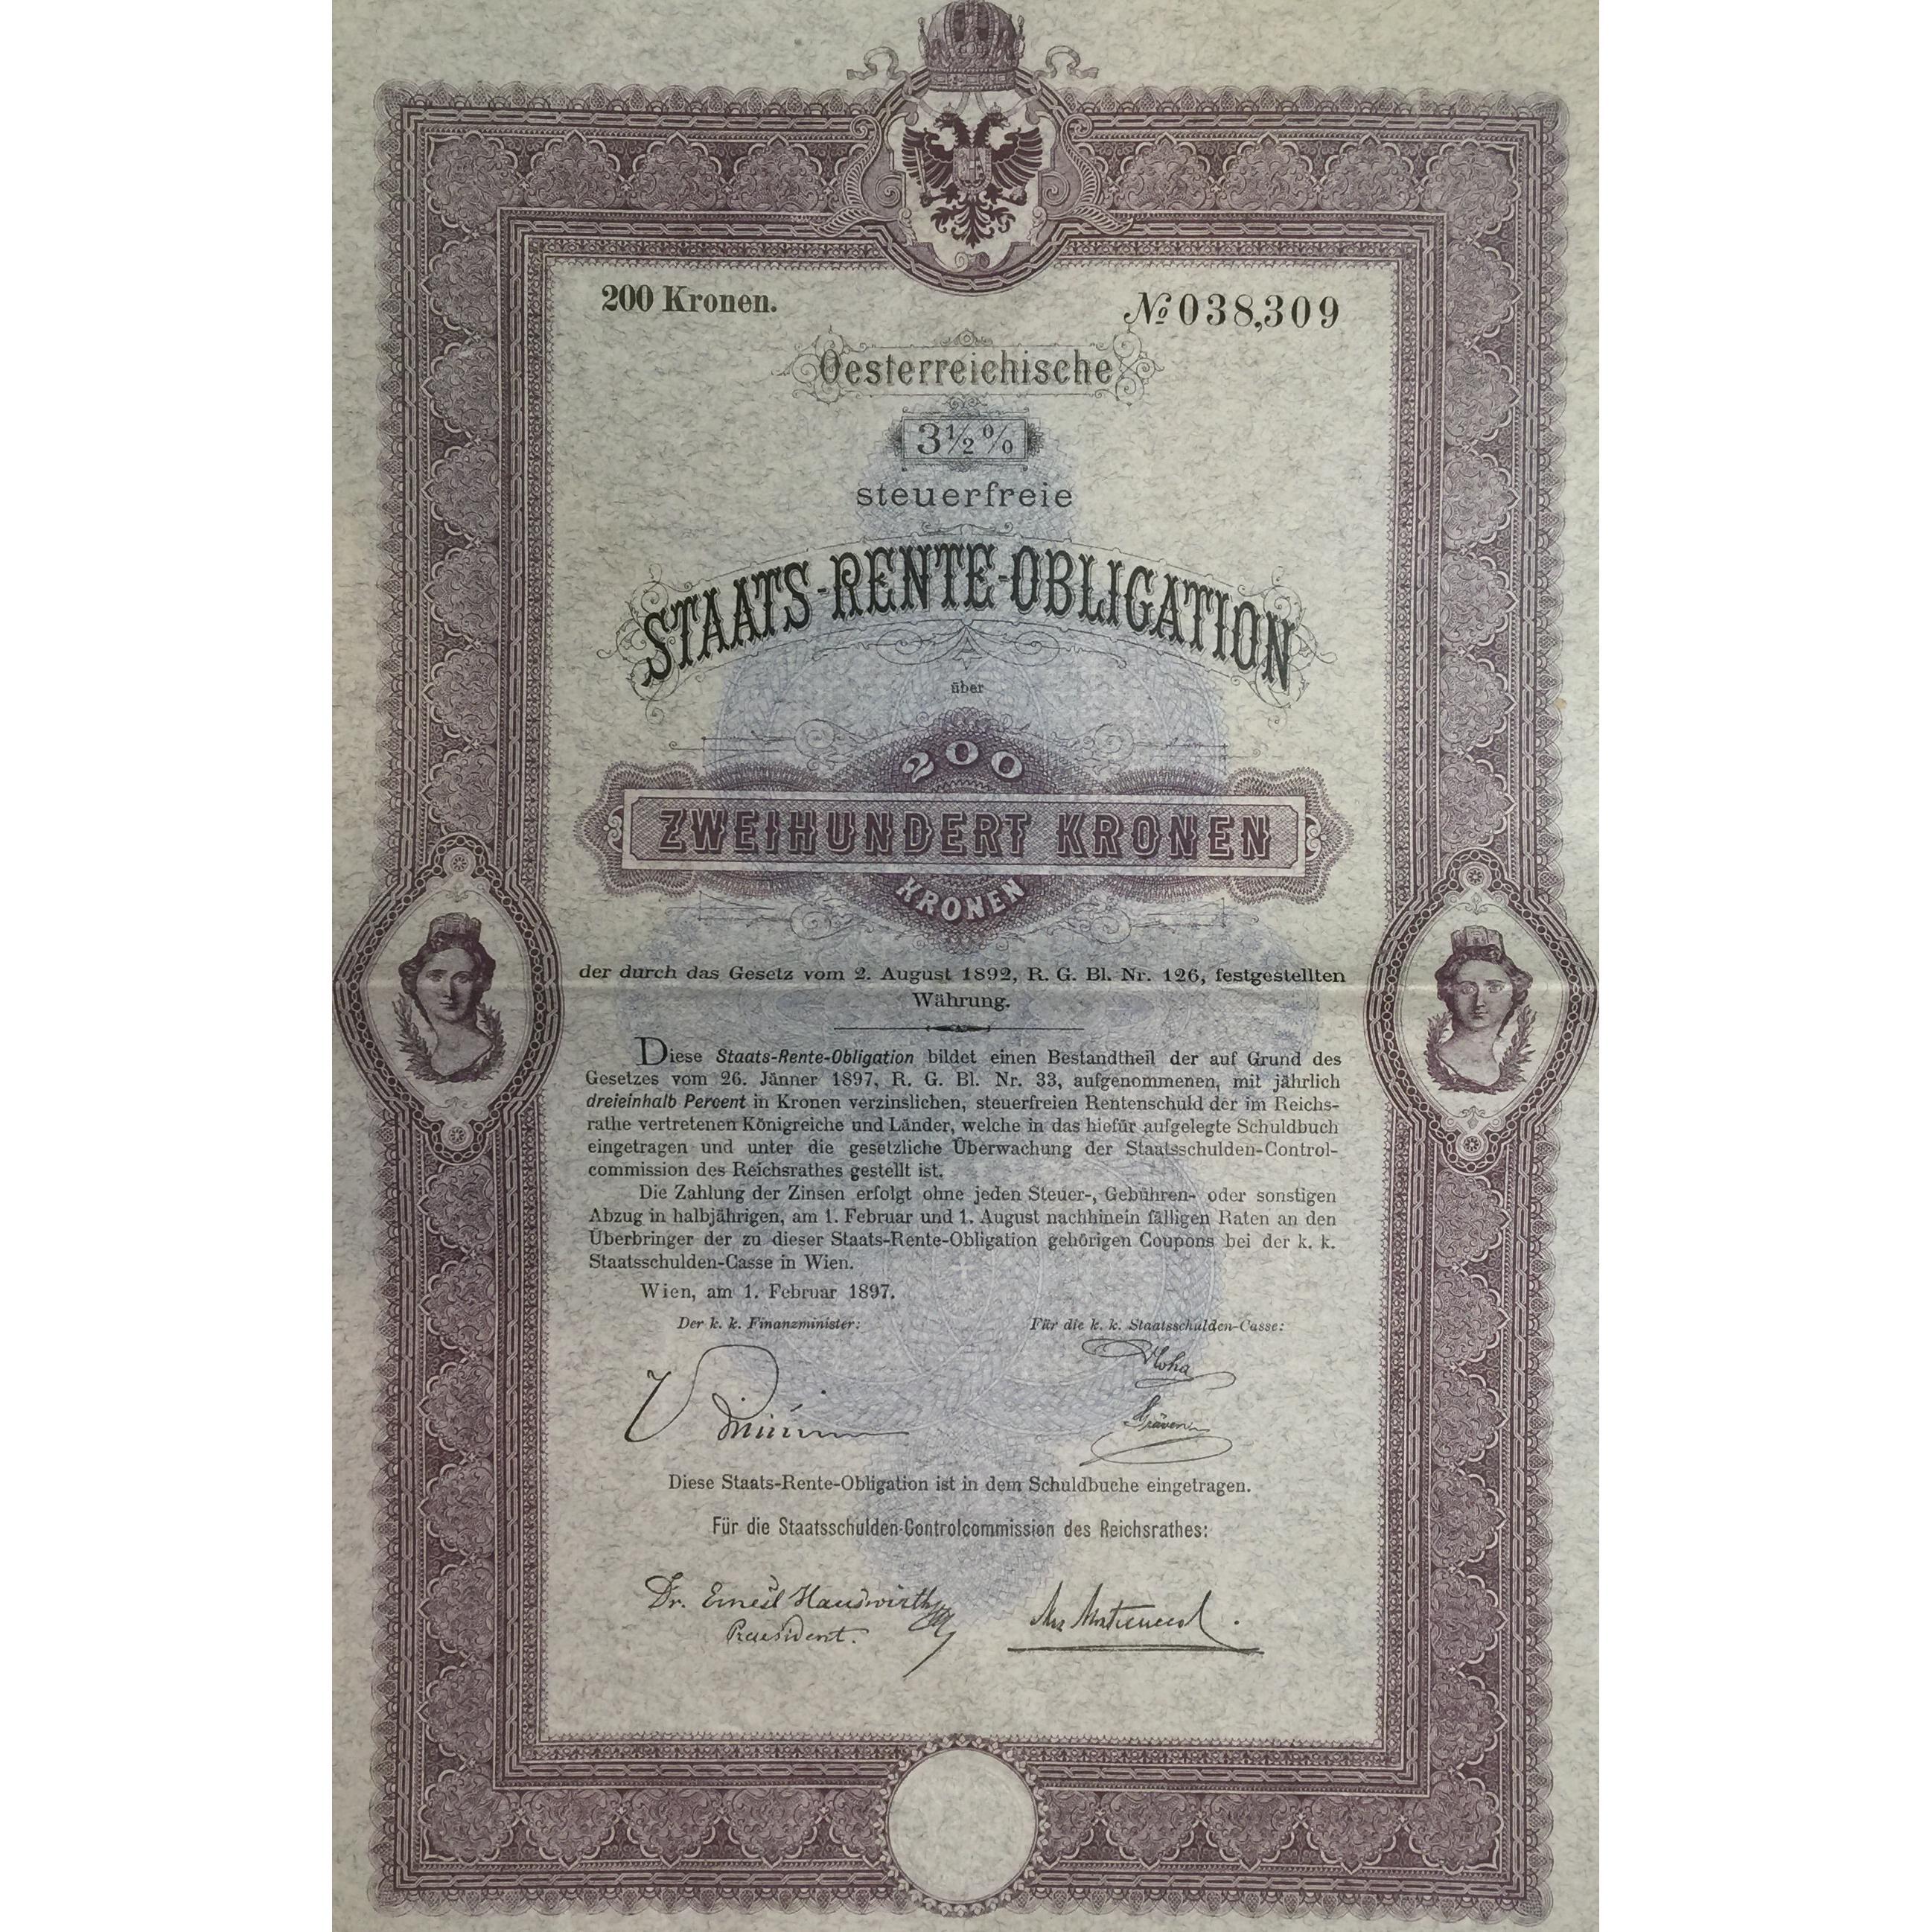 AUSTRIA CITY OF VIENNA 4 /% BOND stock certificate 1902 400 CROWNS